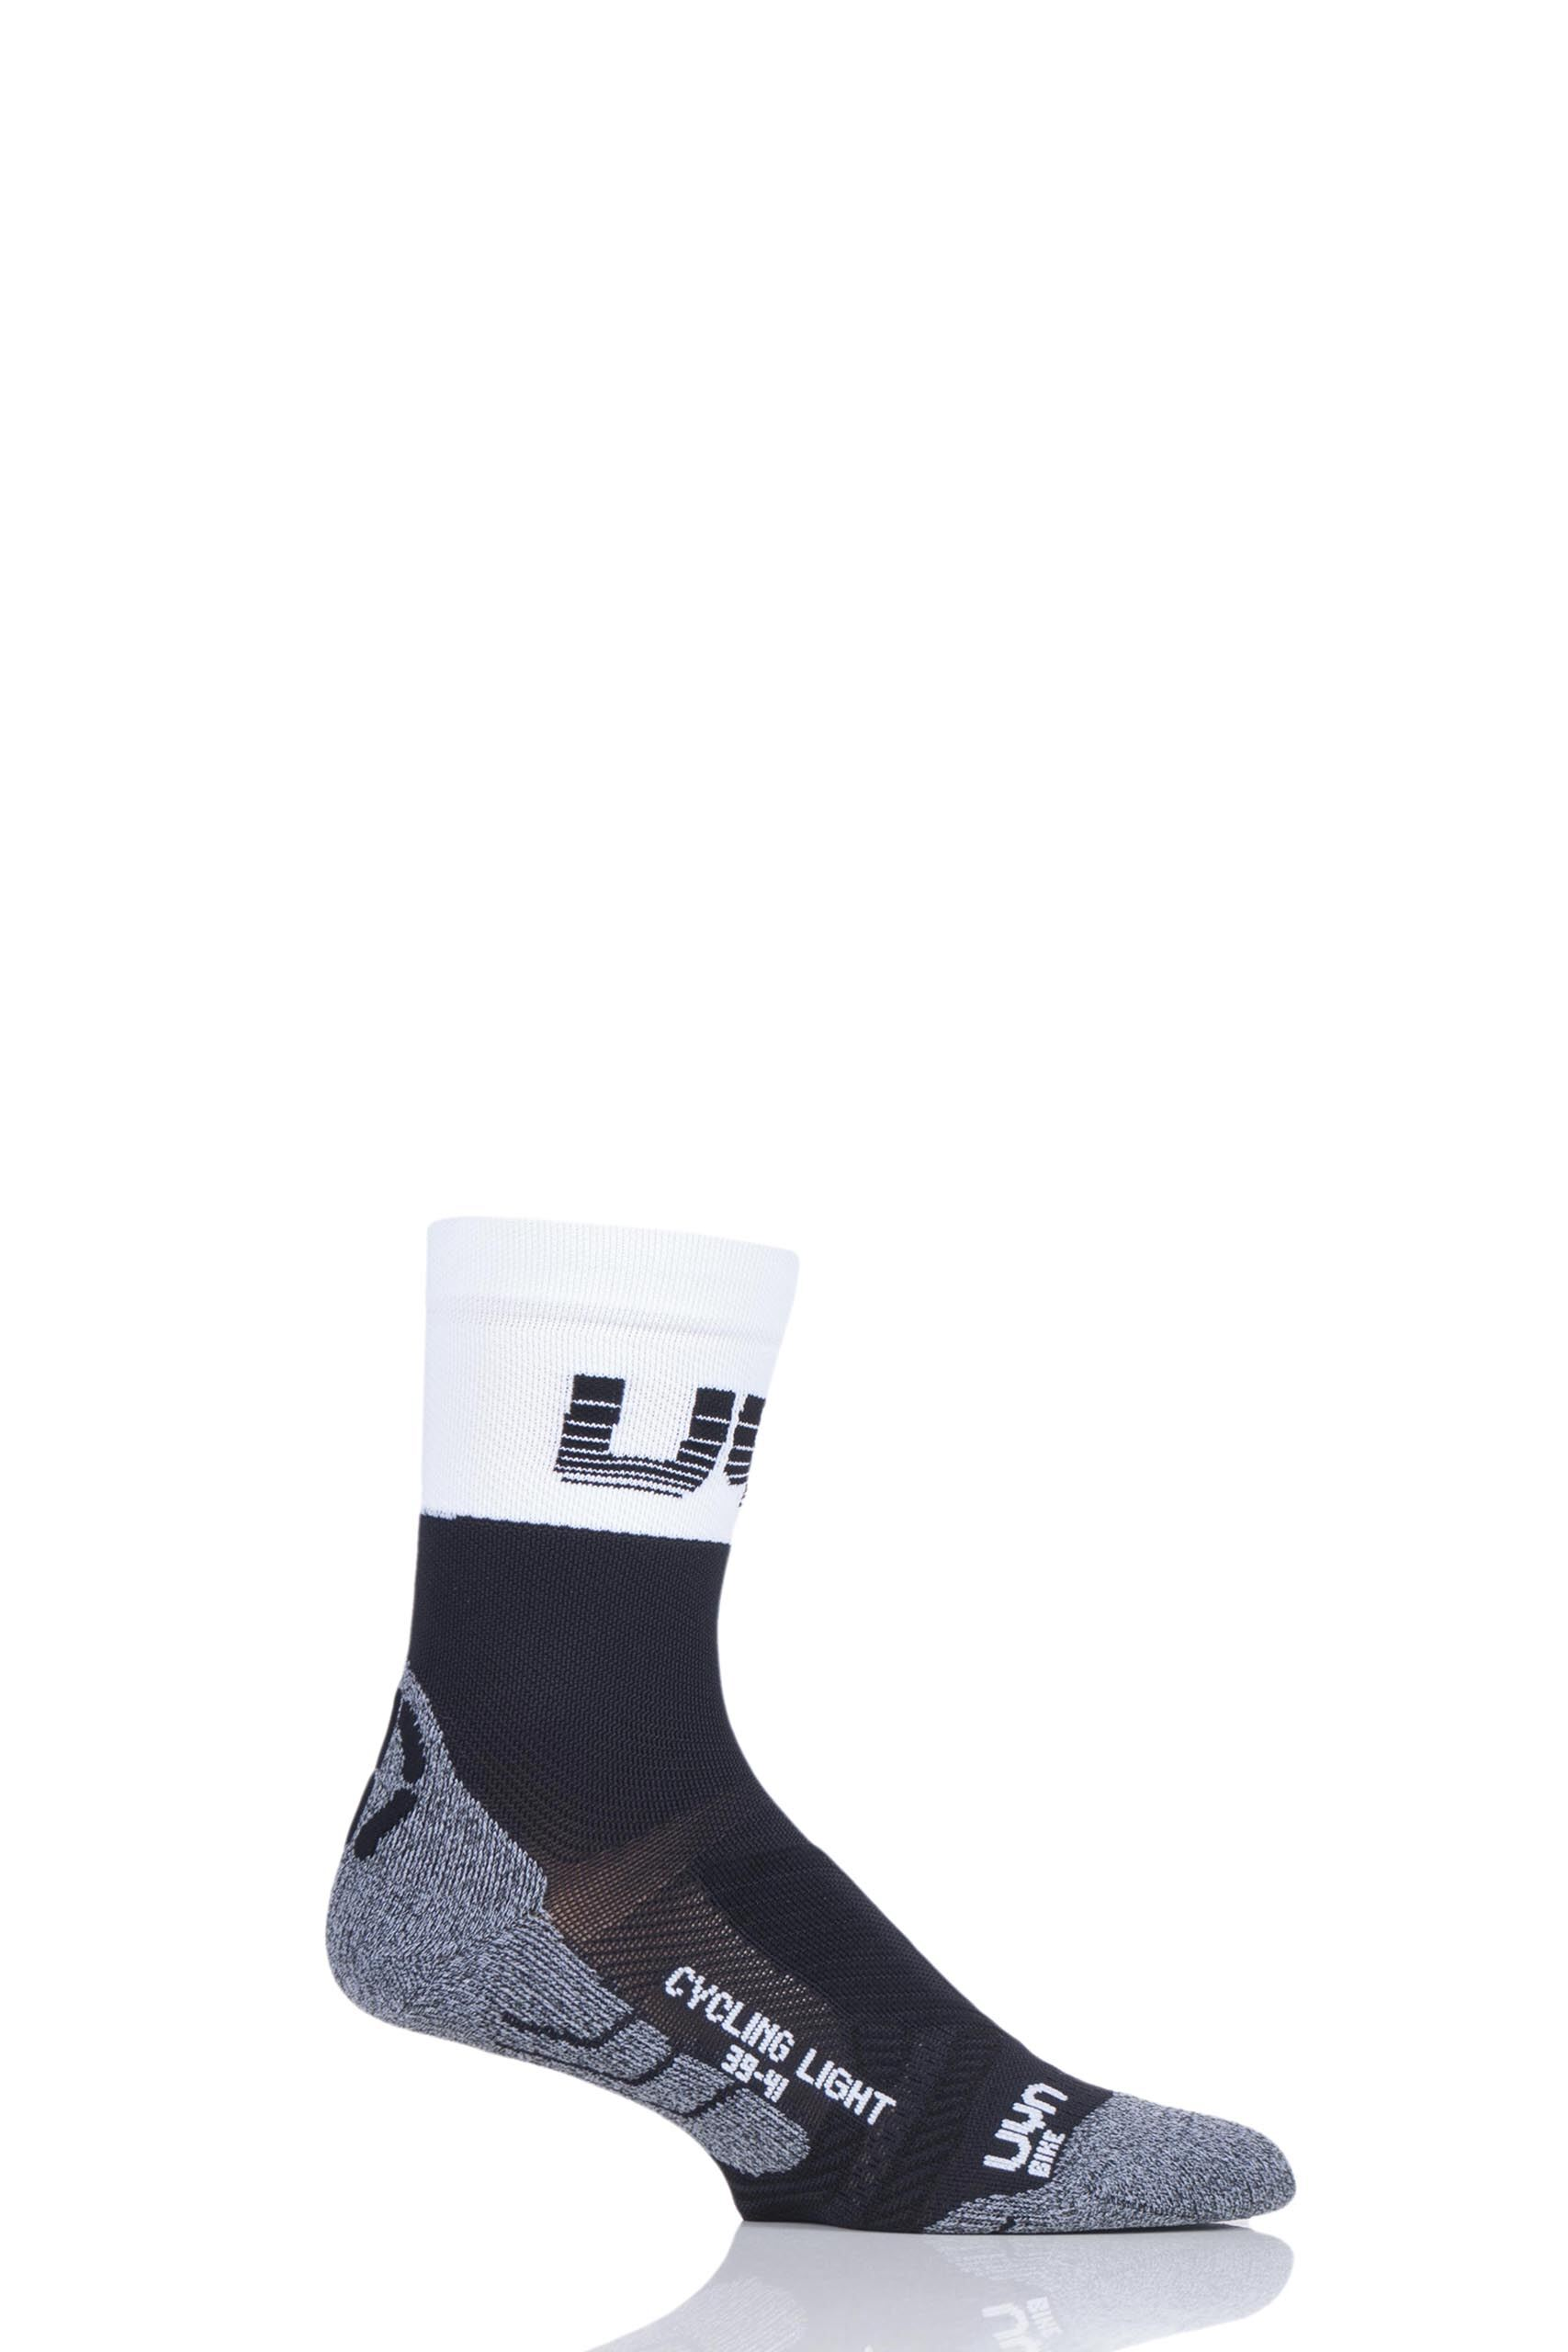 Image of 1 Pair Black Cycling Light Weight Socks Men's 10-12 Mens - UYN